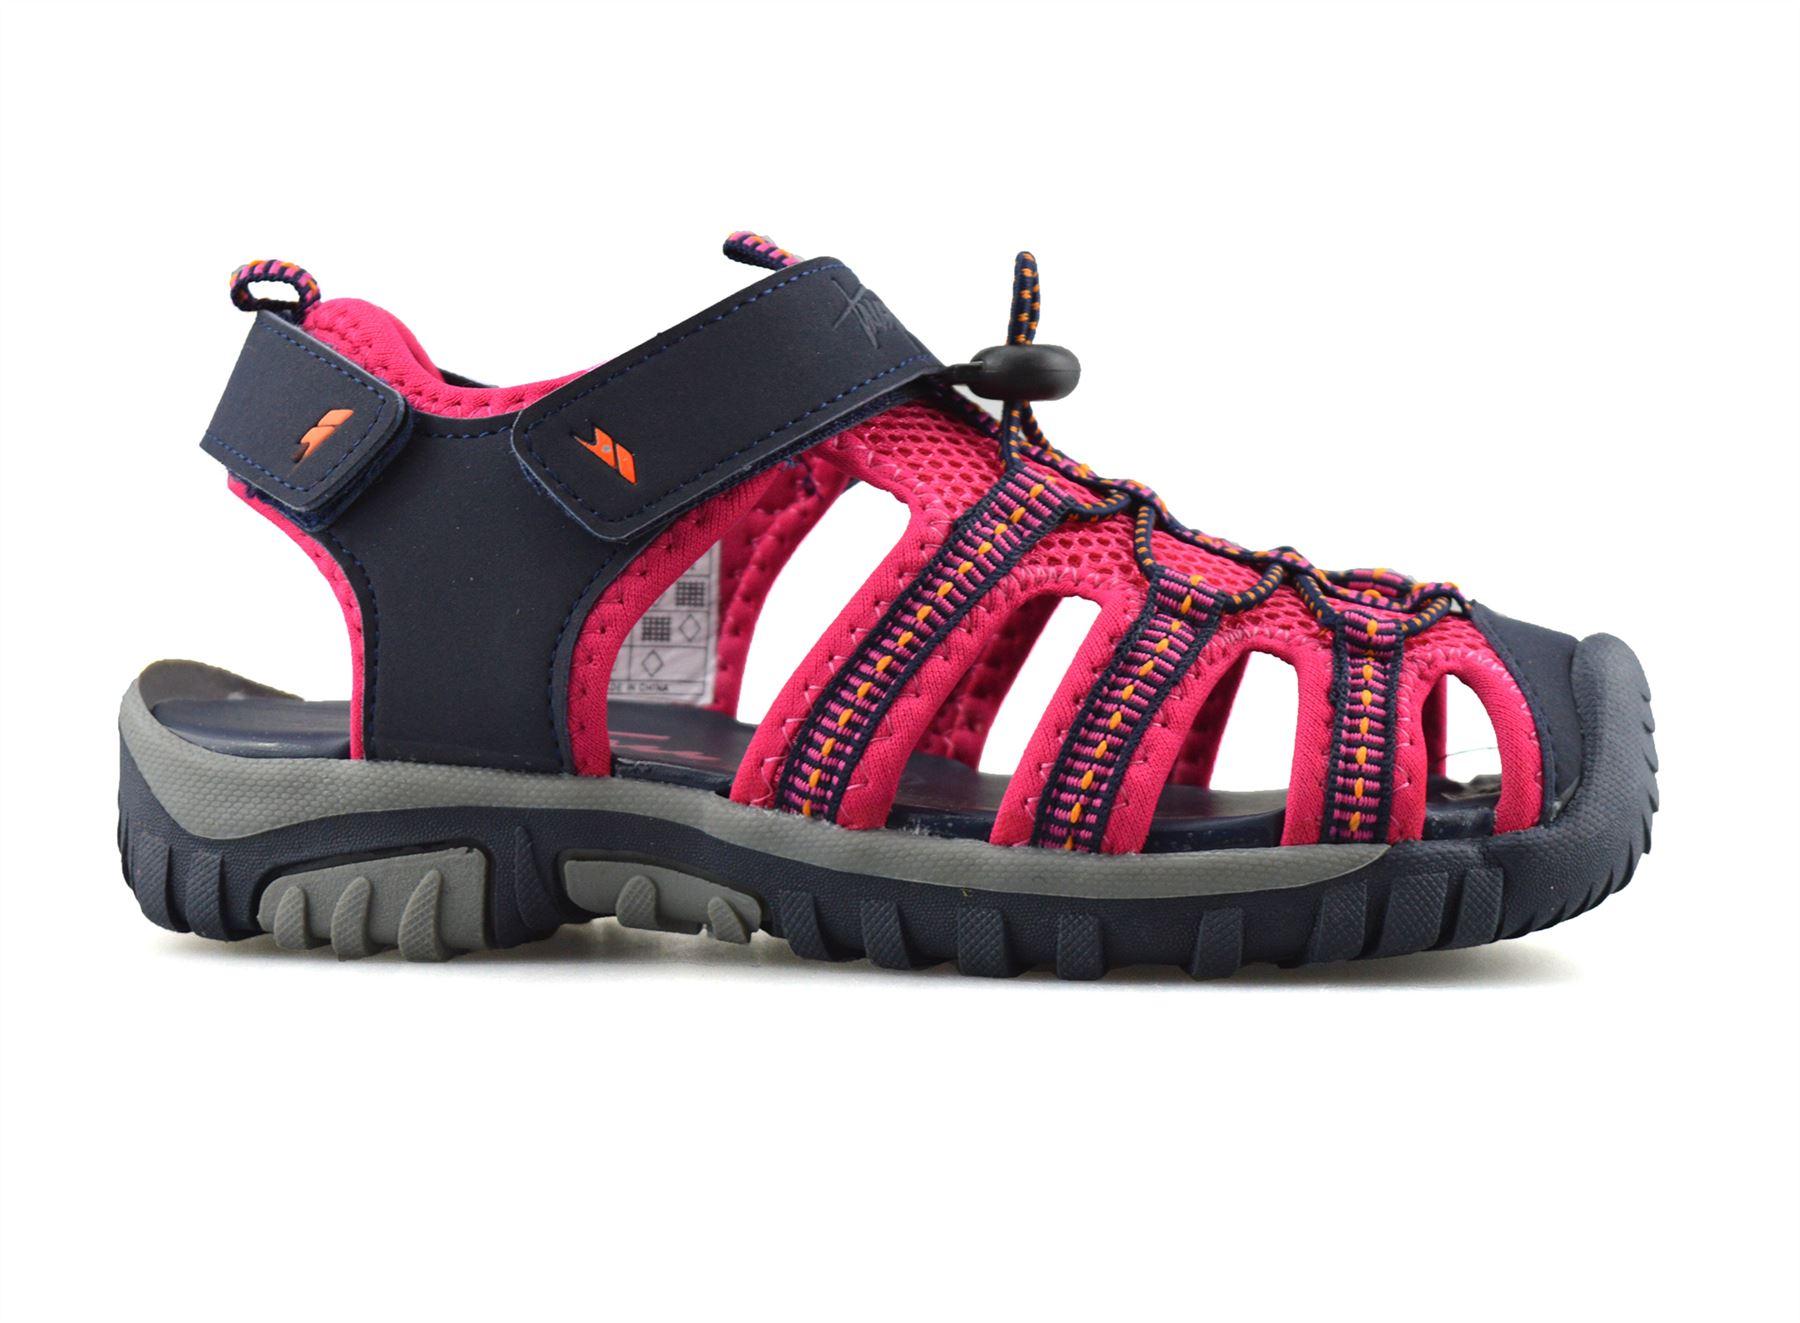 Boys-Girls-Kids-Trespass-Summer-Beach-Casual-Walking-Sports-Sandals-Shoes-Size thumbnail 29